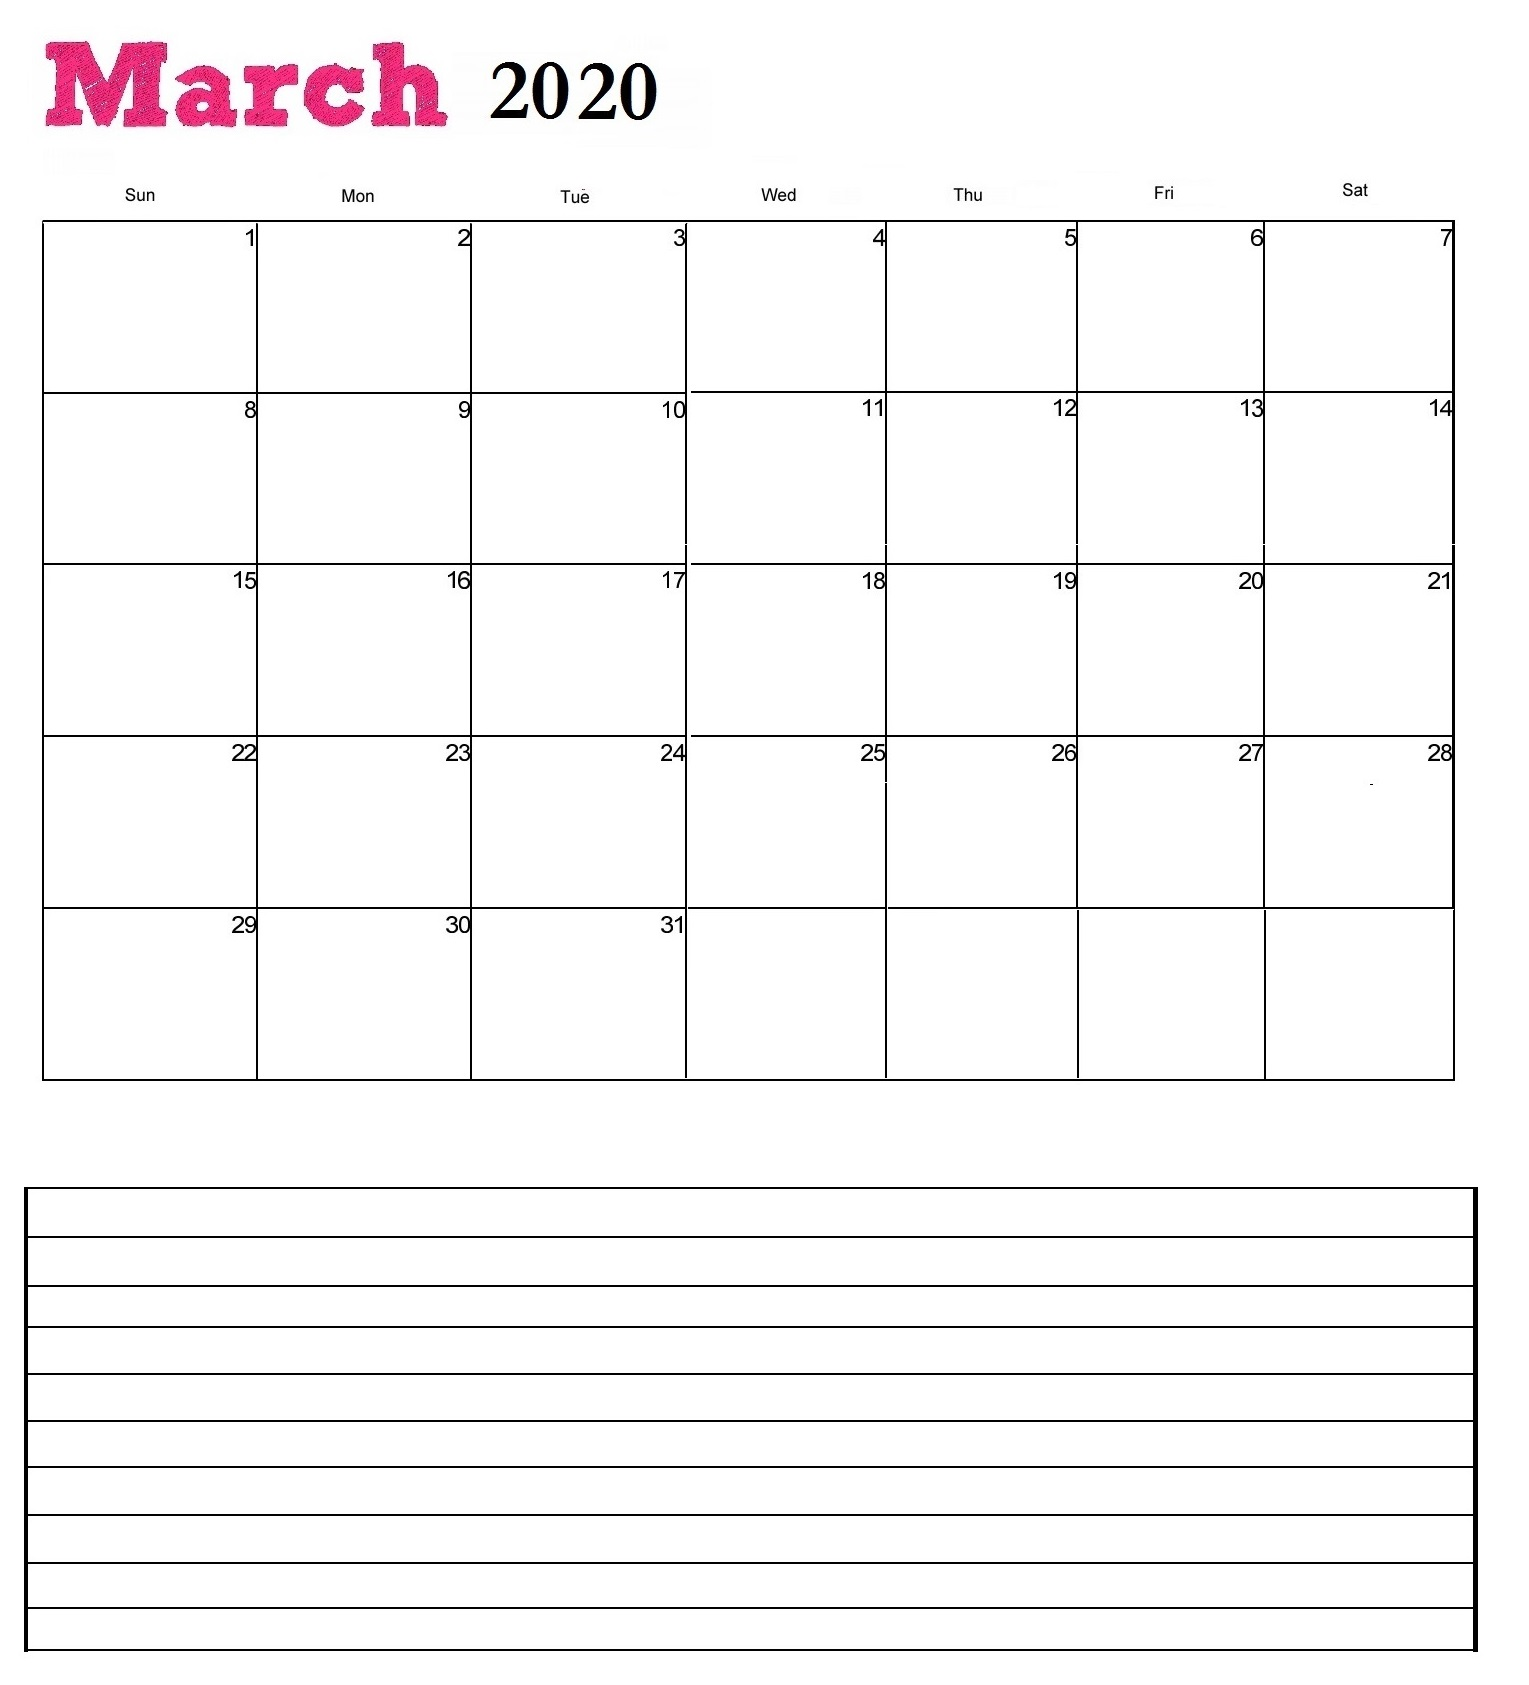 March 2020 Calendar for desk